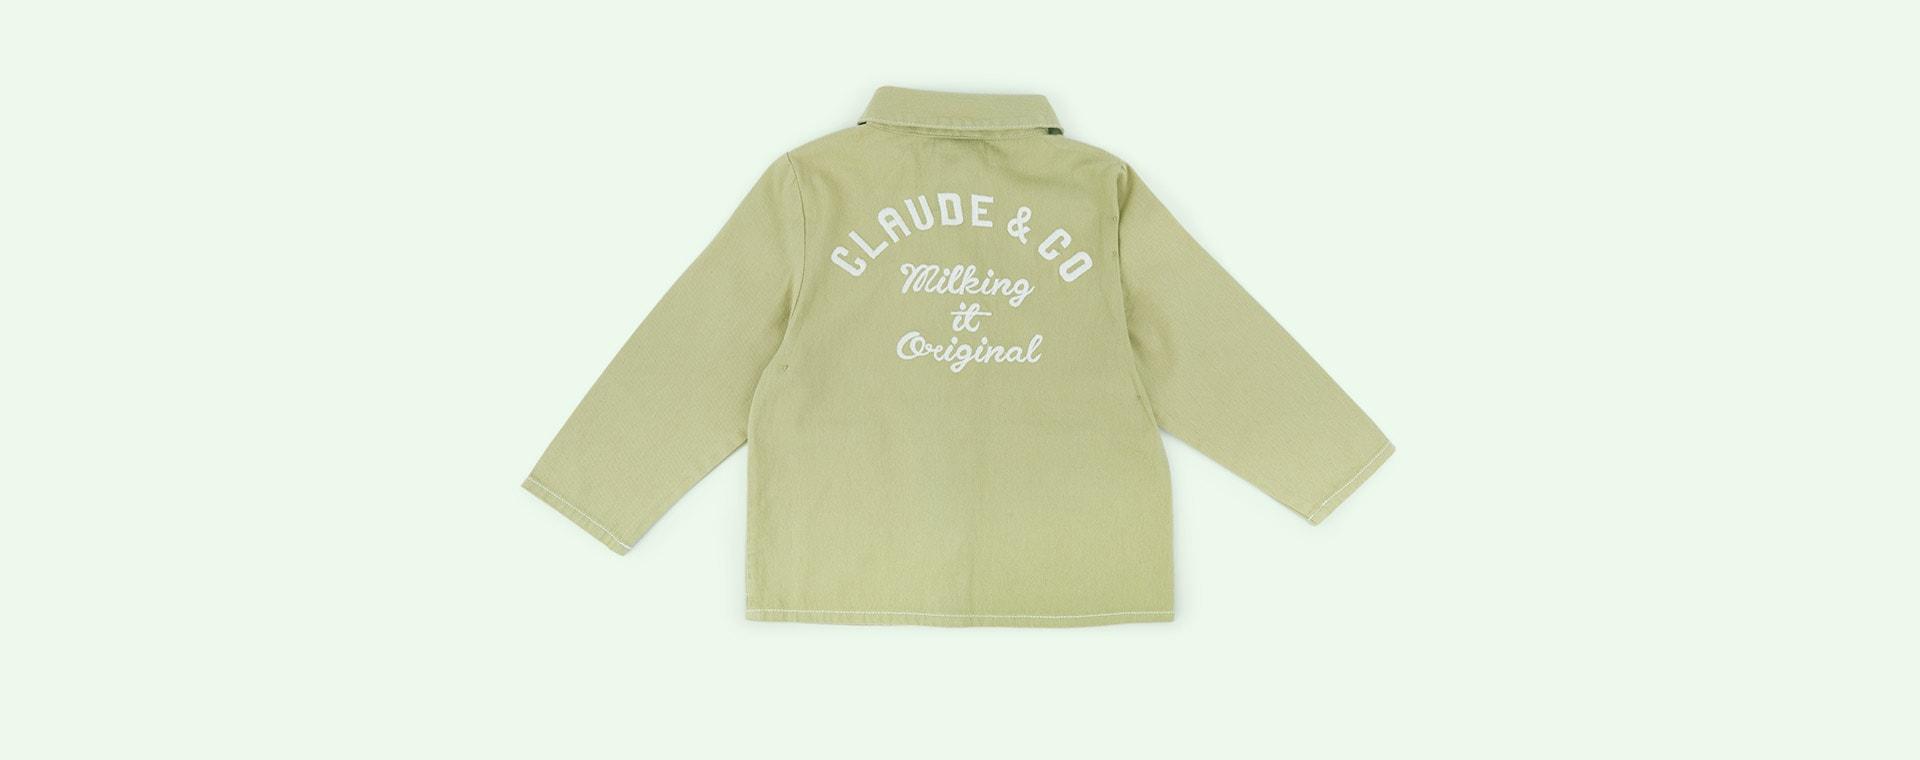 Sage Green Claude & Co Worker Jacket